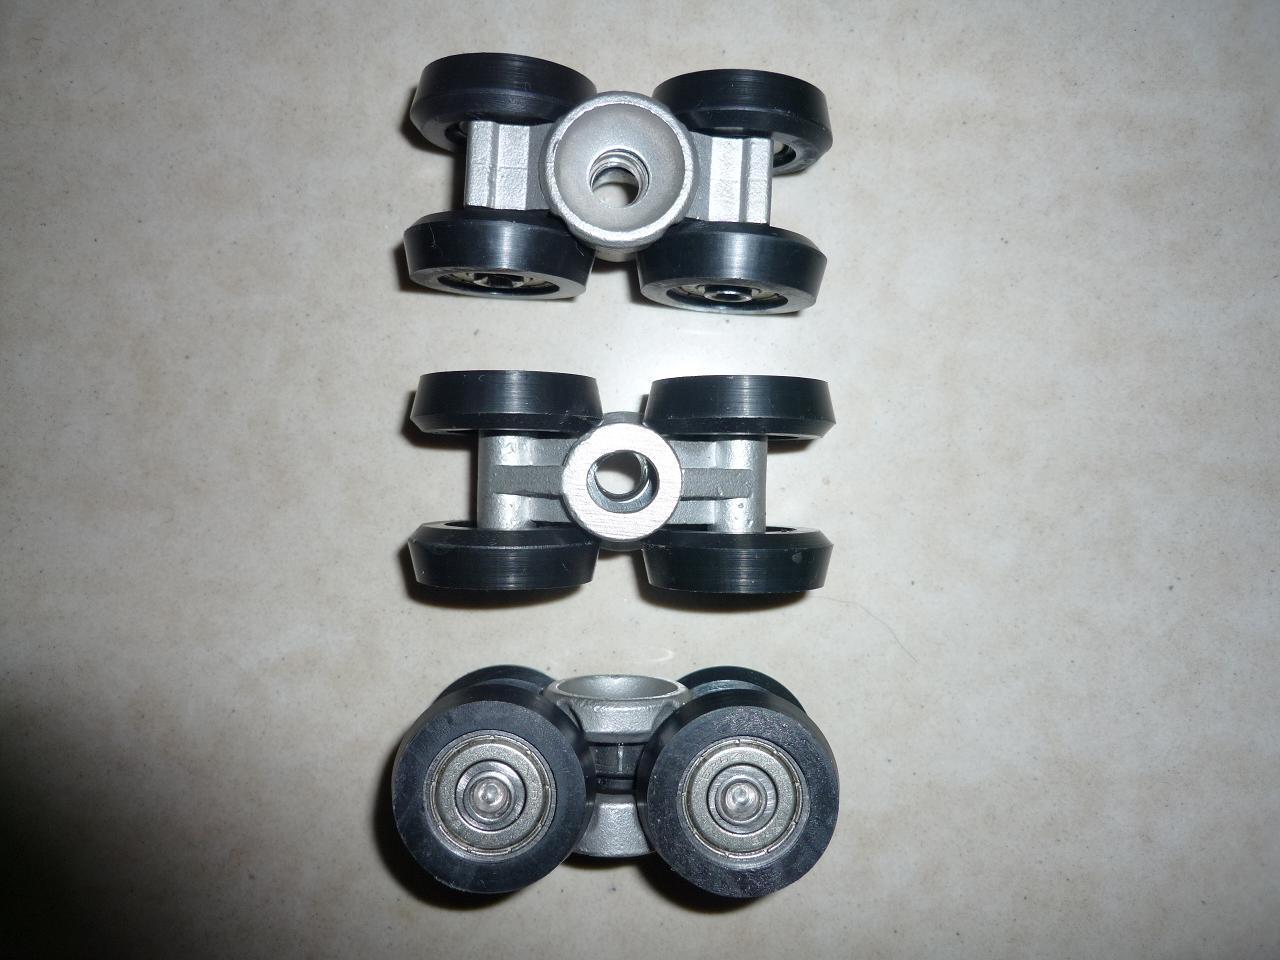 Rol pld 1021 rol pld 1021 doorningbo yinzhou pulleydass hardware manufacturer co ltd - Douchekamer model ...